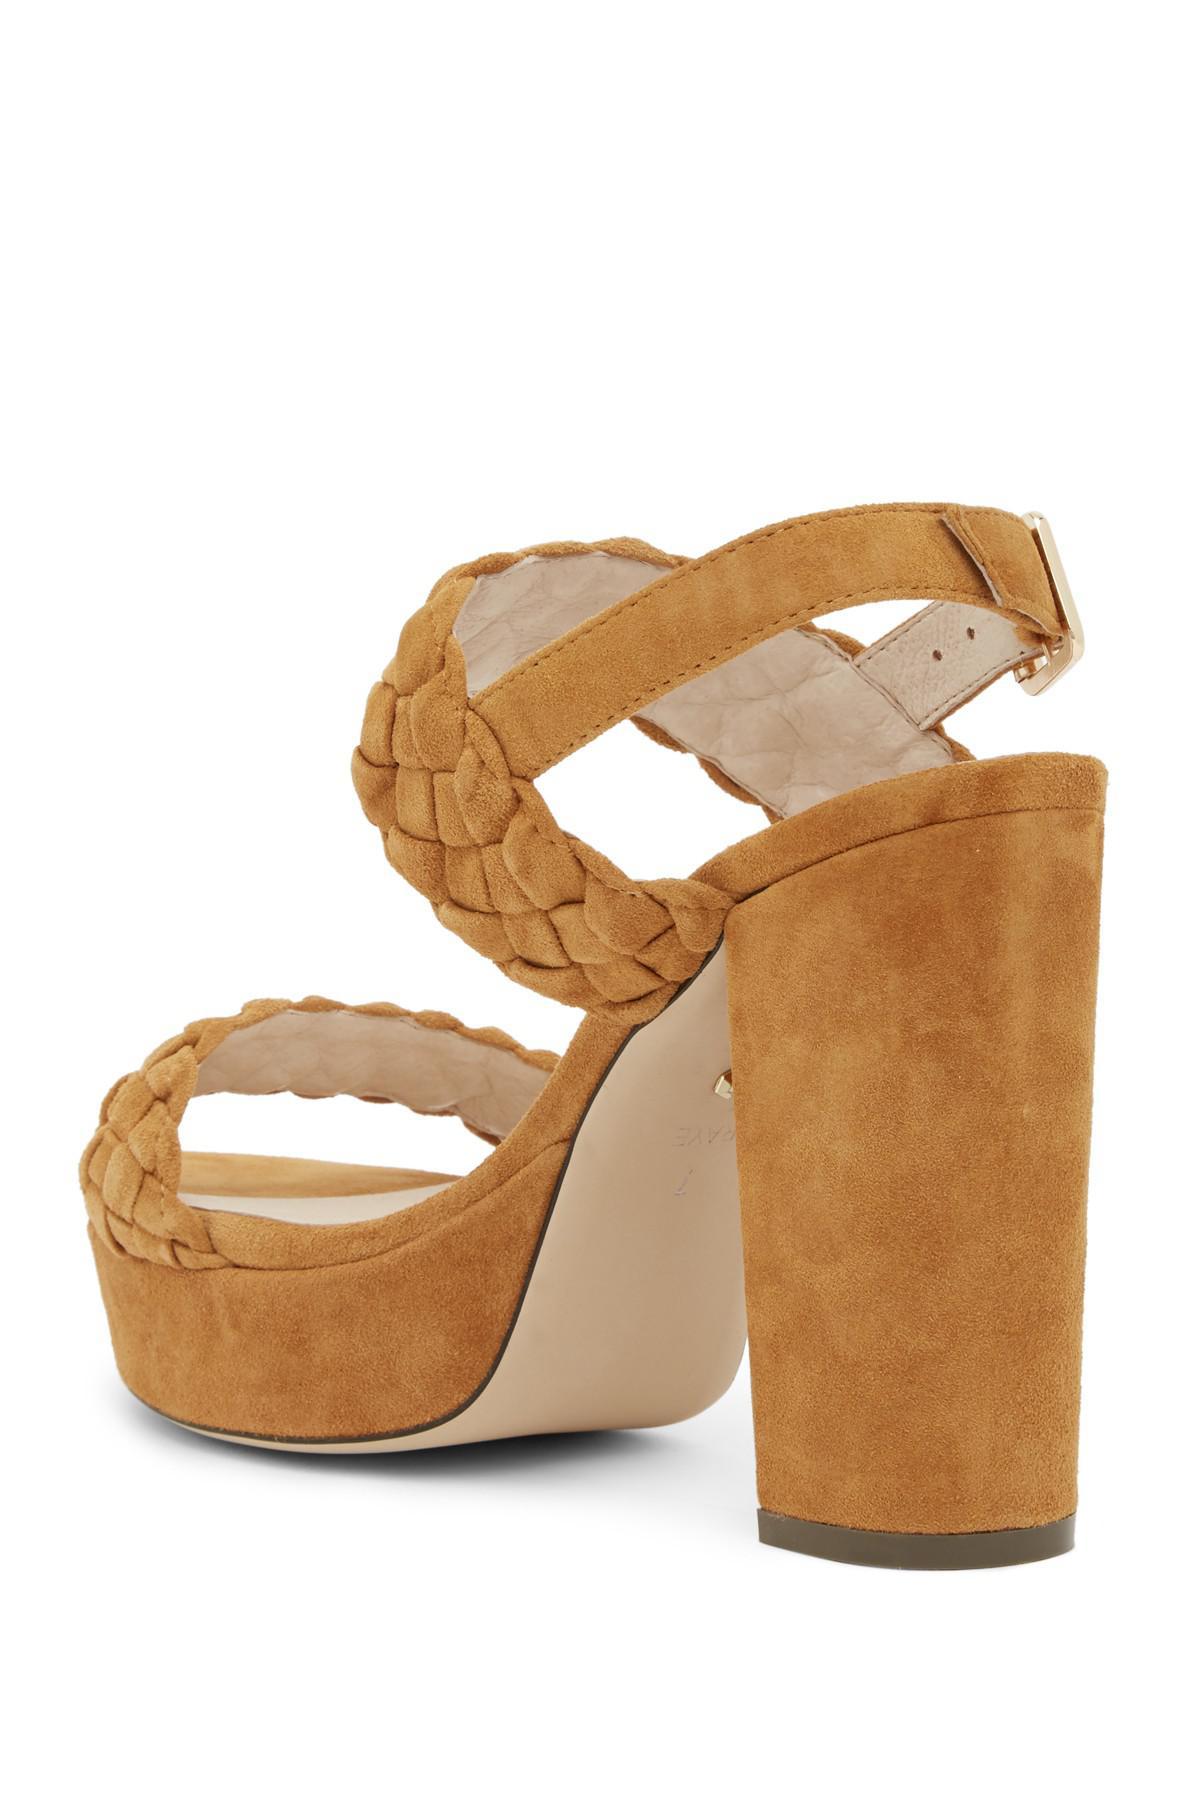 RAYE Haven Braided Platform Sandal 4MCkn5